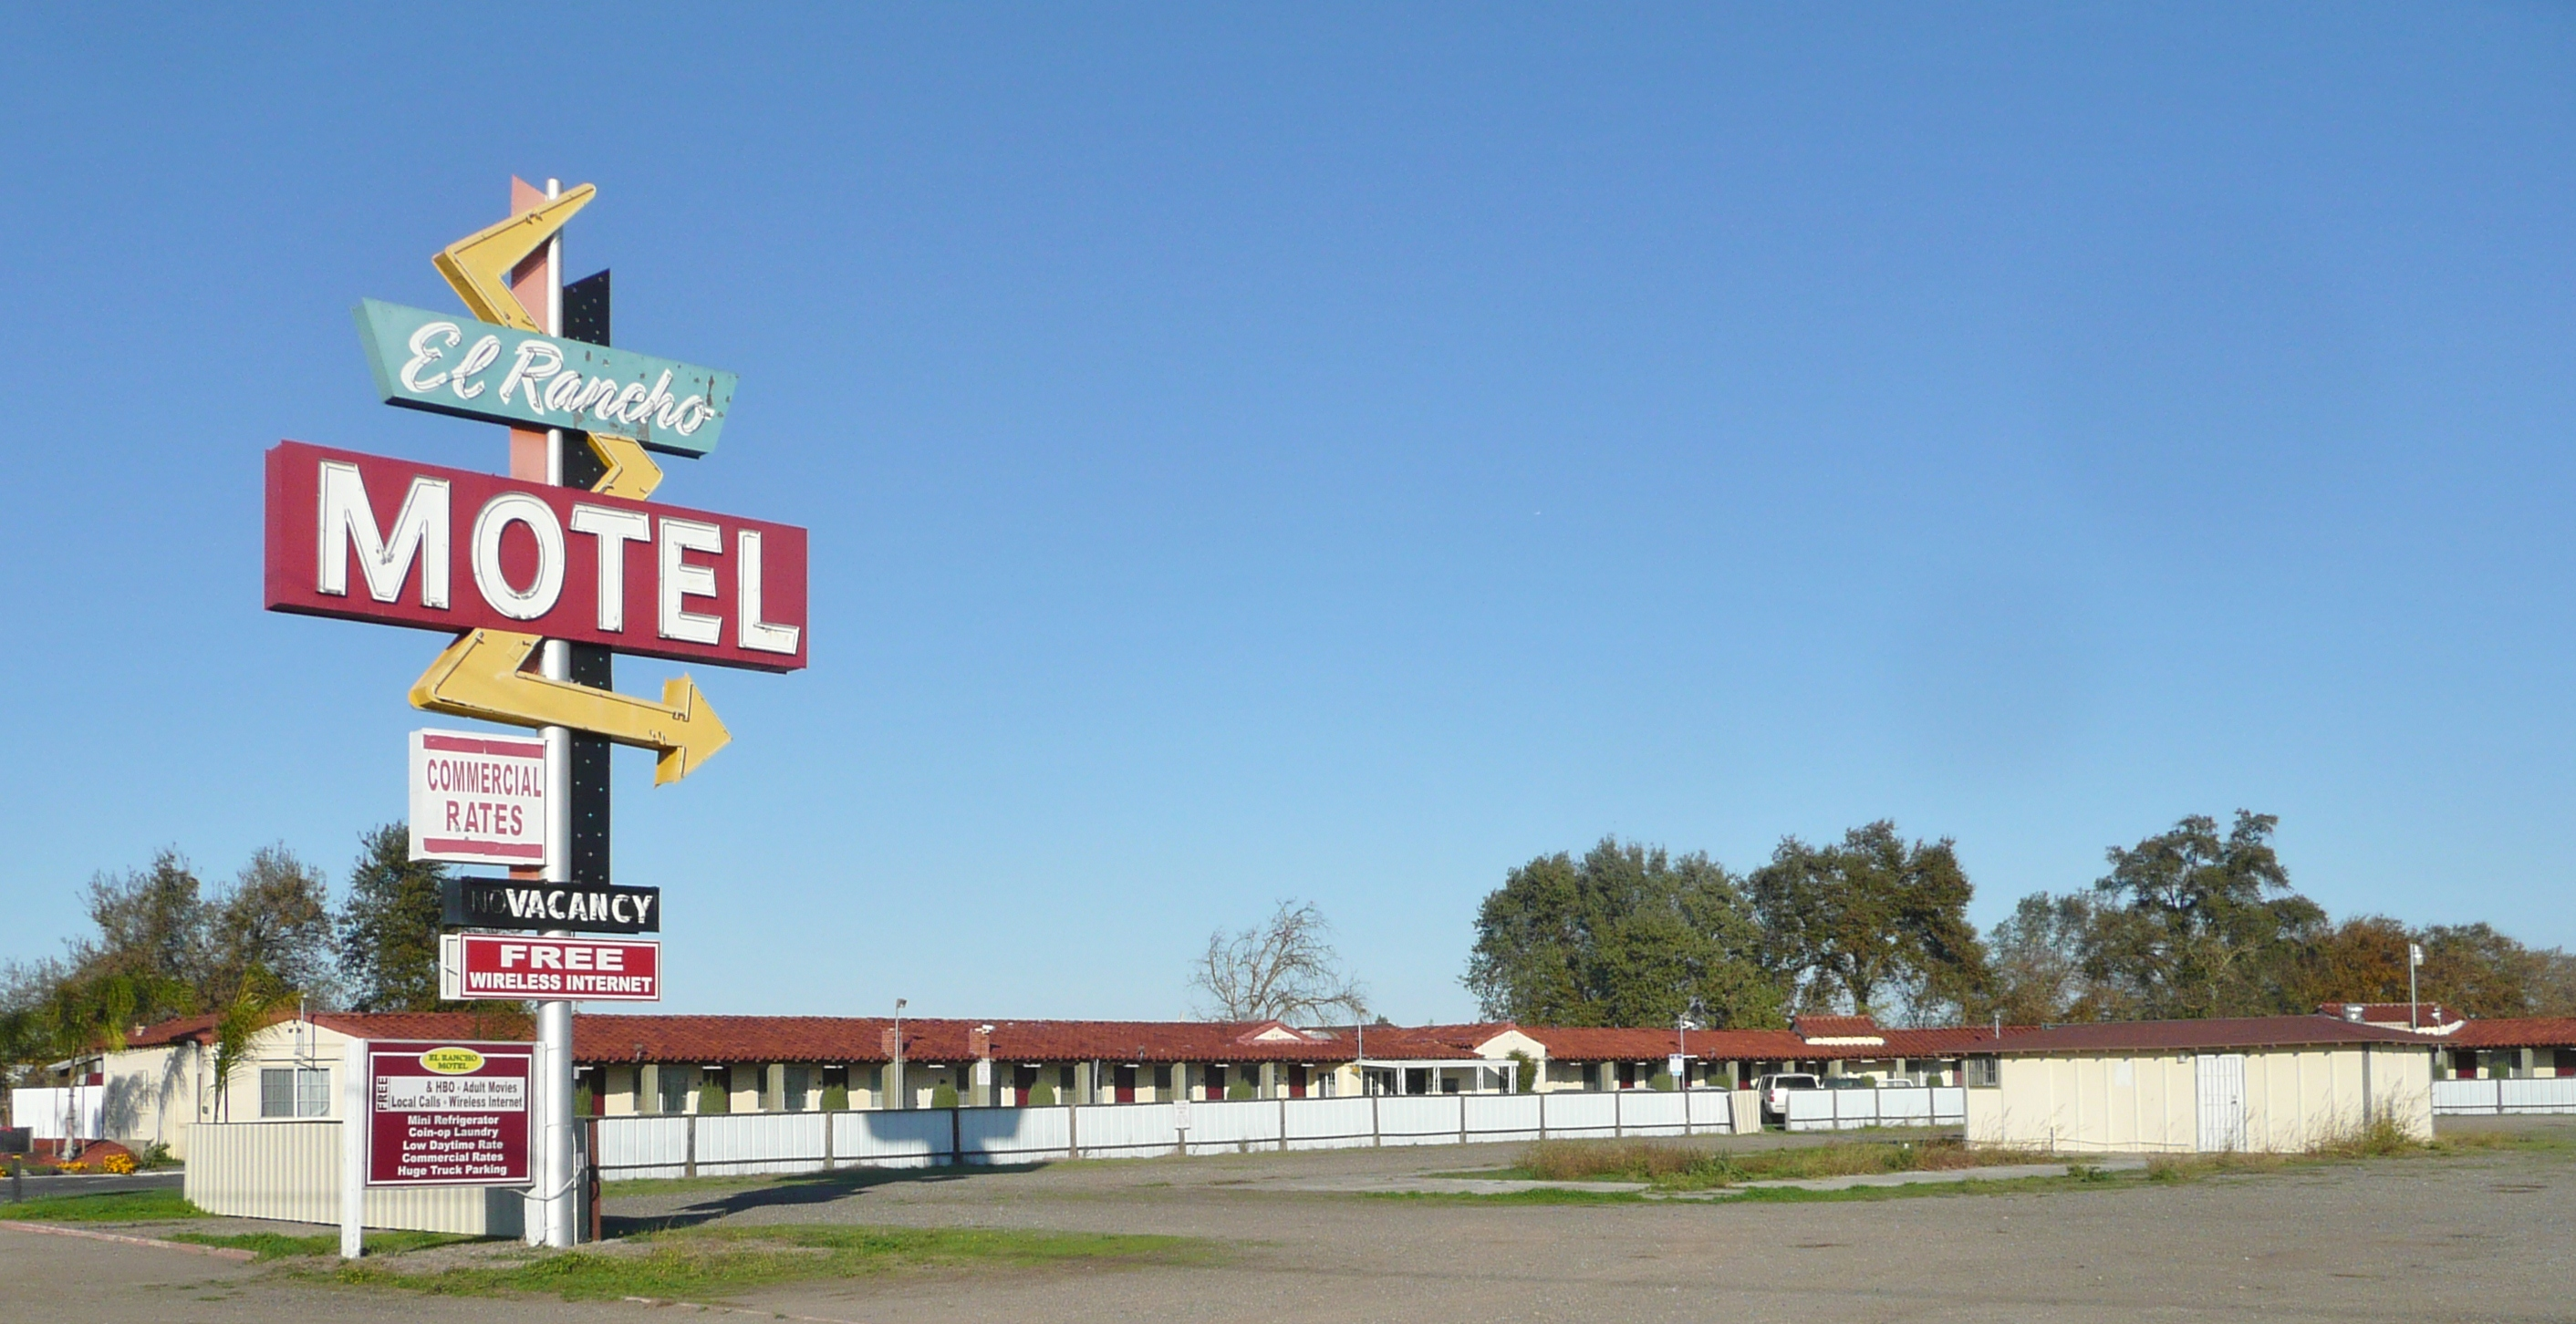 El Rancho Motel - 5936 California 99, Stockton, California U.S.A. - December 3, 2011